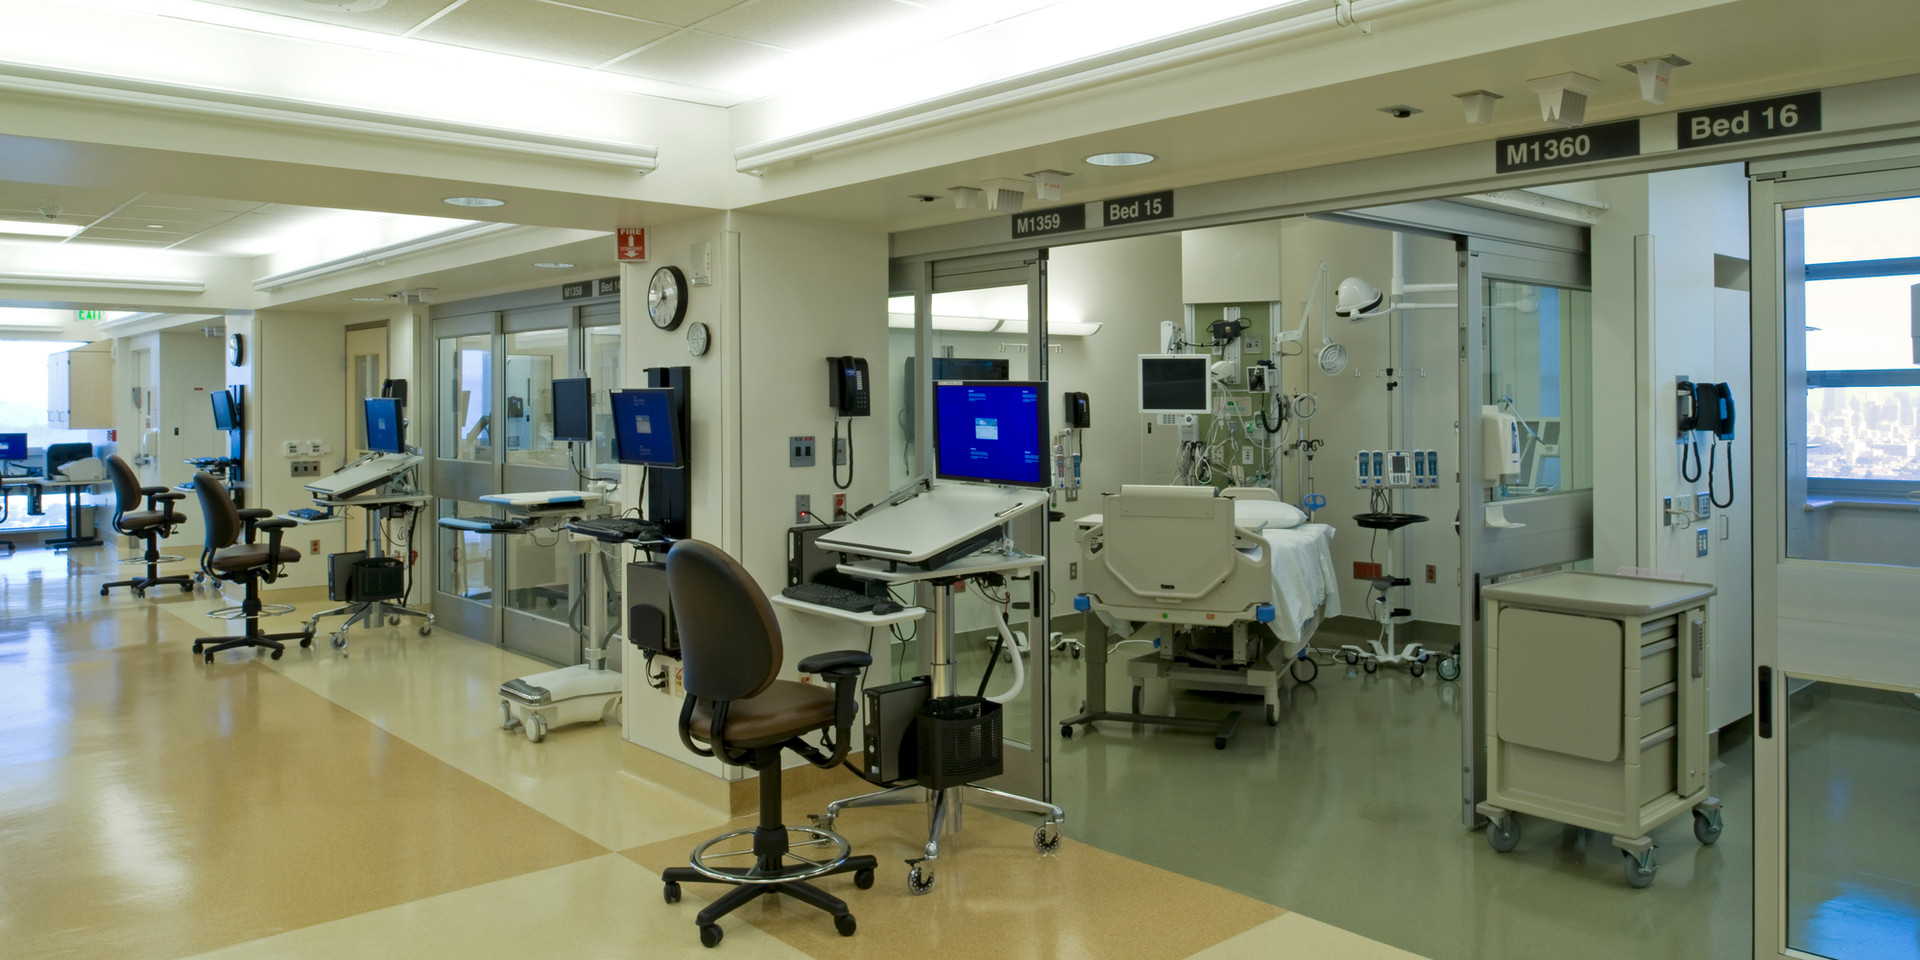 UCSF Medical Center - ICU